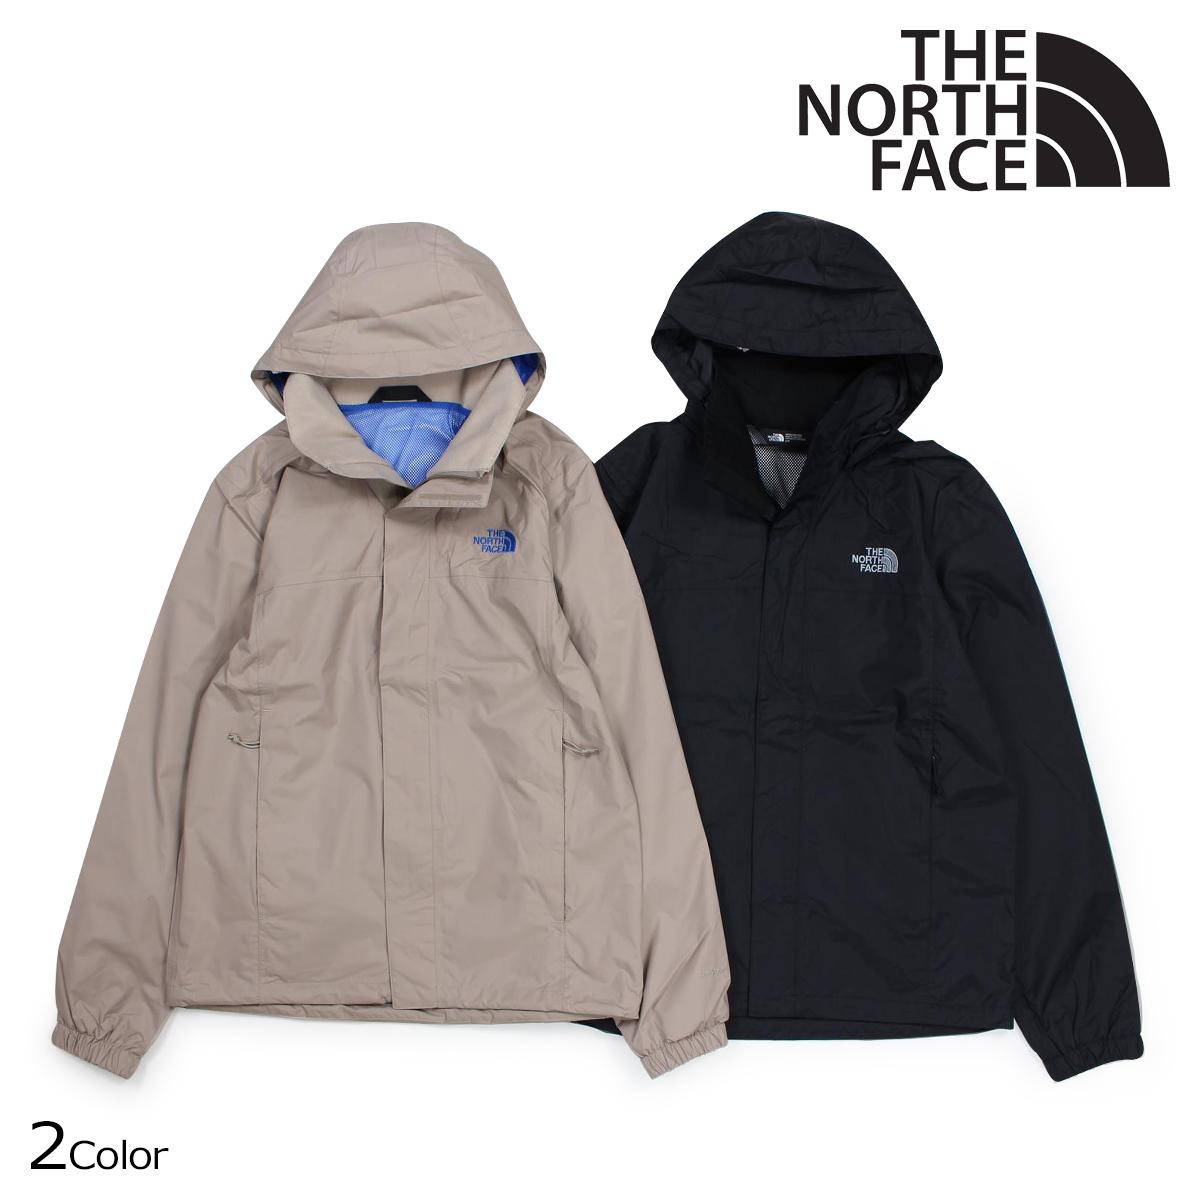 The North Face Resolve 2 BlackBlack Jacket